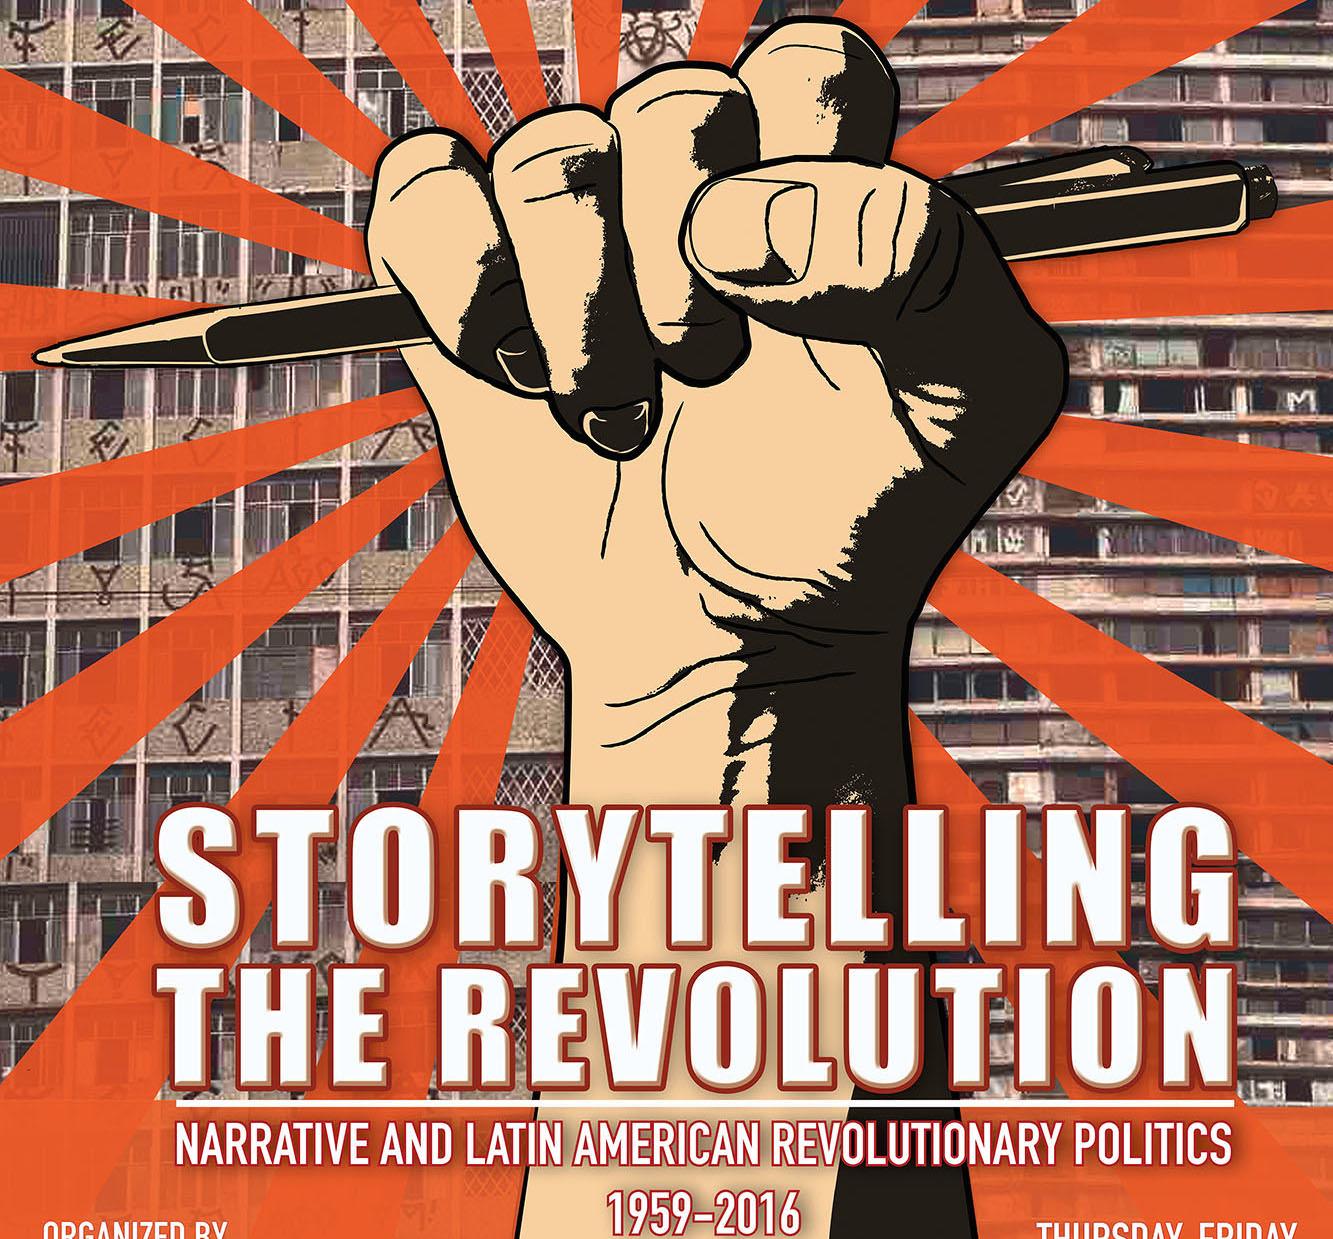 STORYTELLING THE REVOLUTION - Narrative and Latin American Revolutionary Politics 1959-2016 - SYMPOSIUM